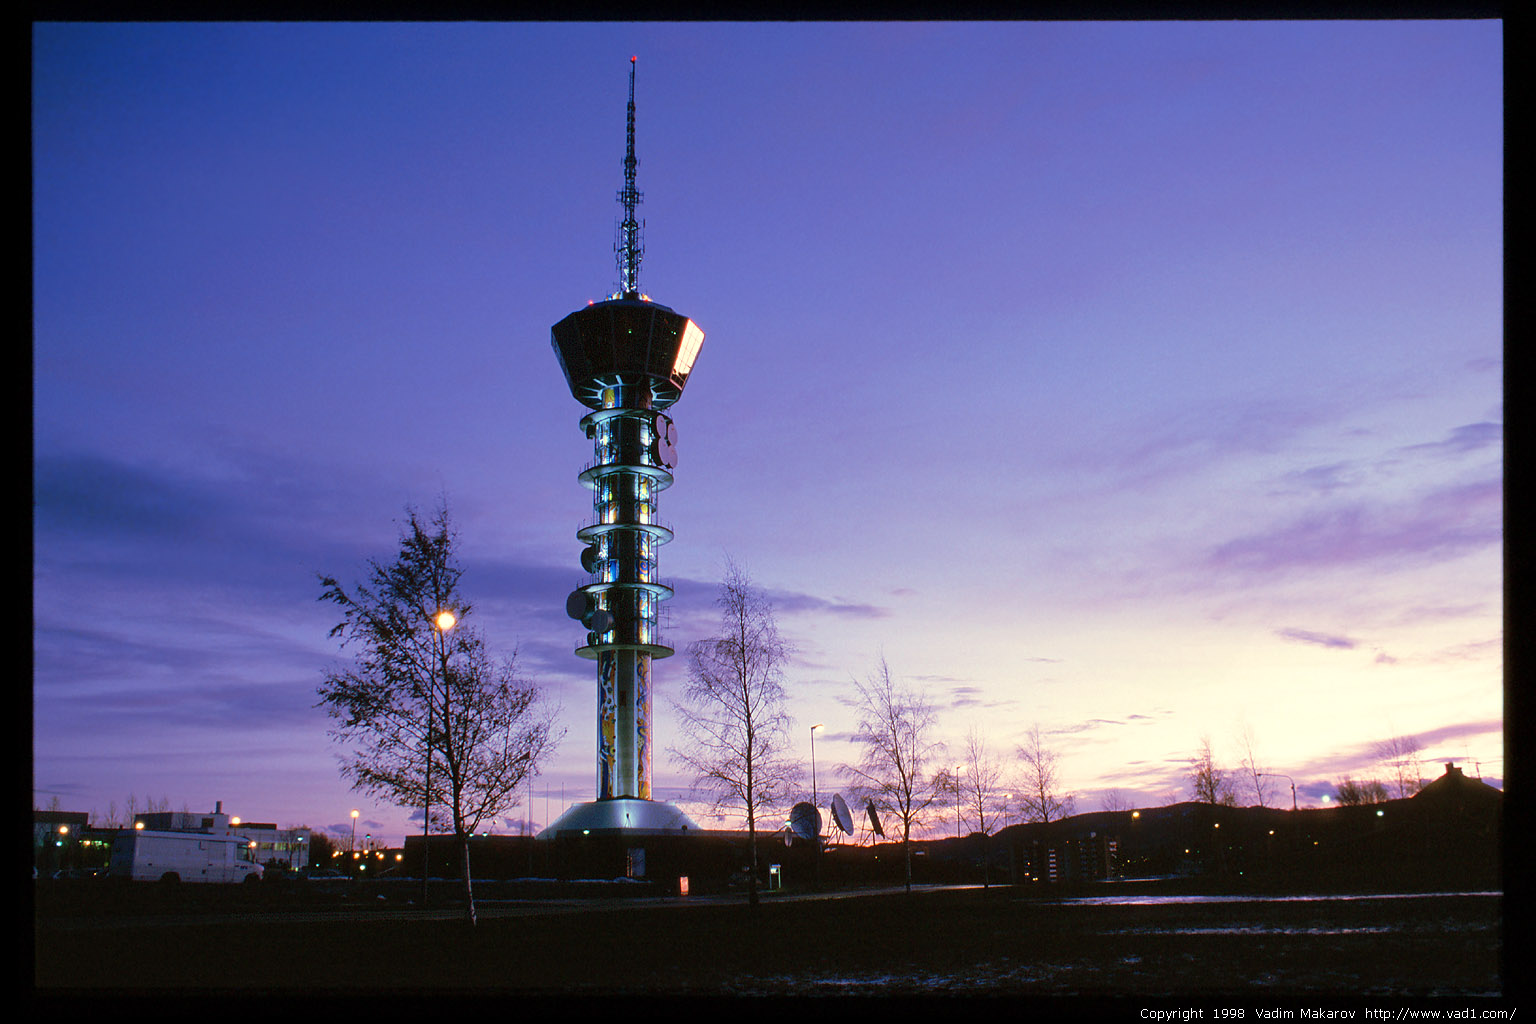 Photo Tyholt Trnet Tyholt TV Tower